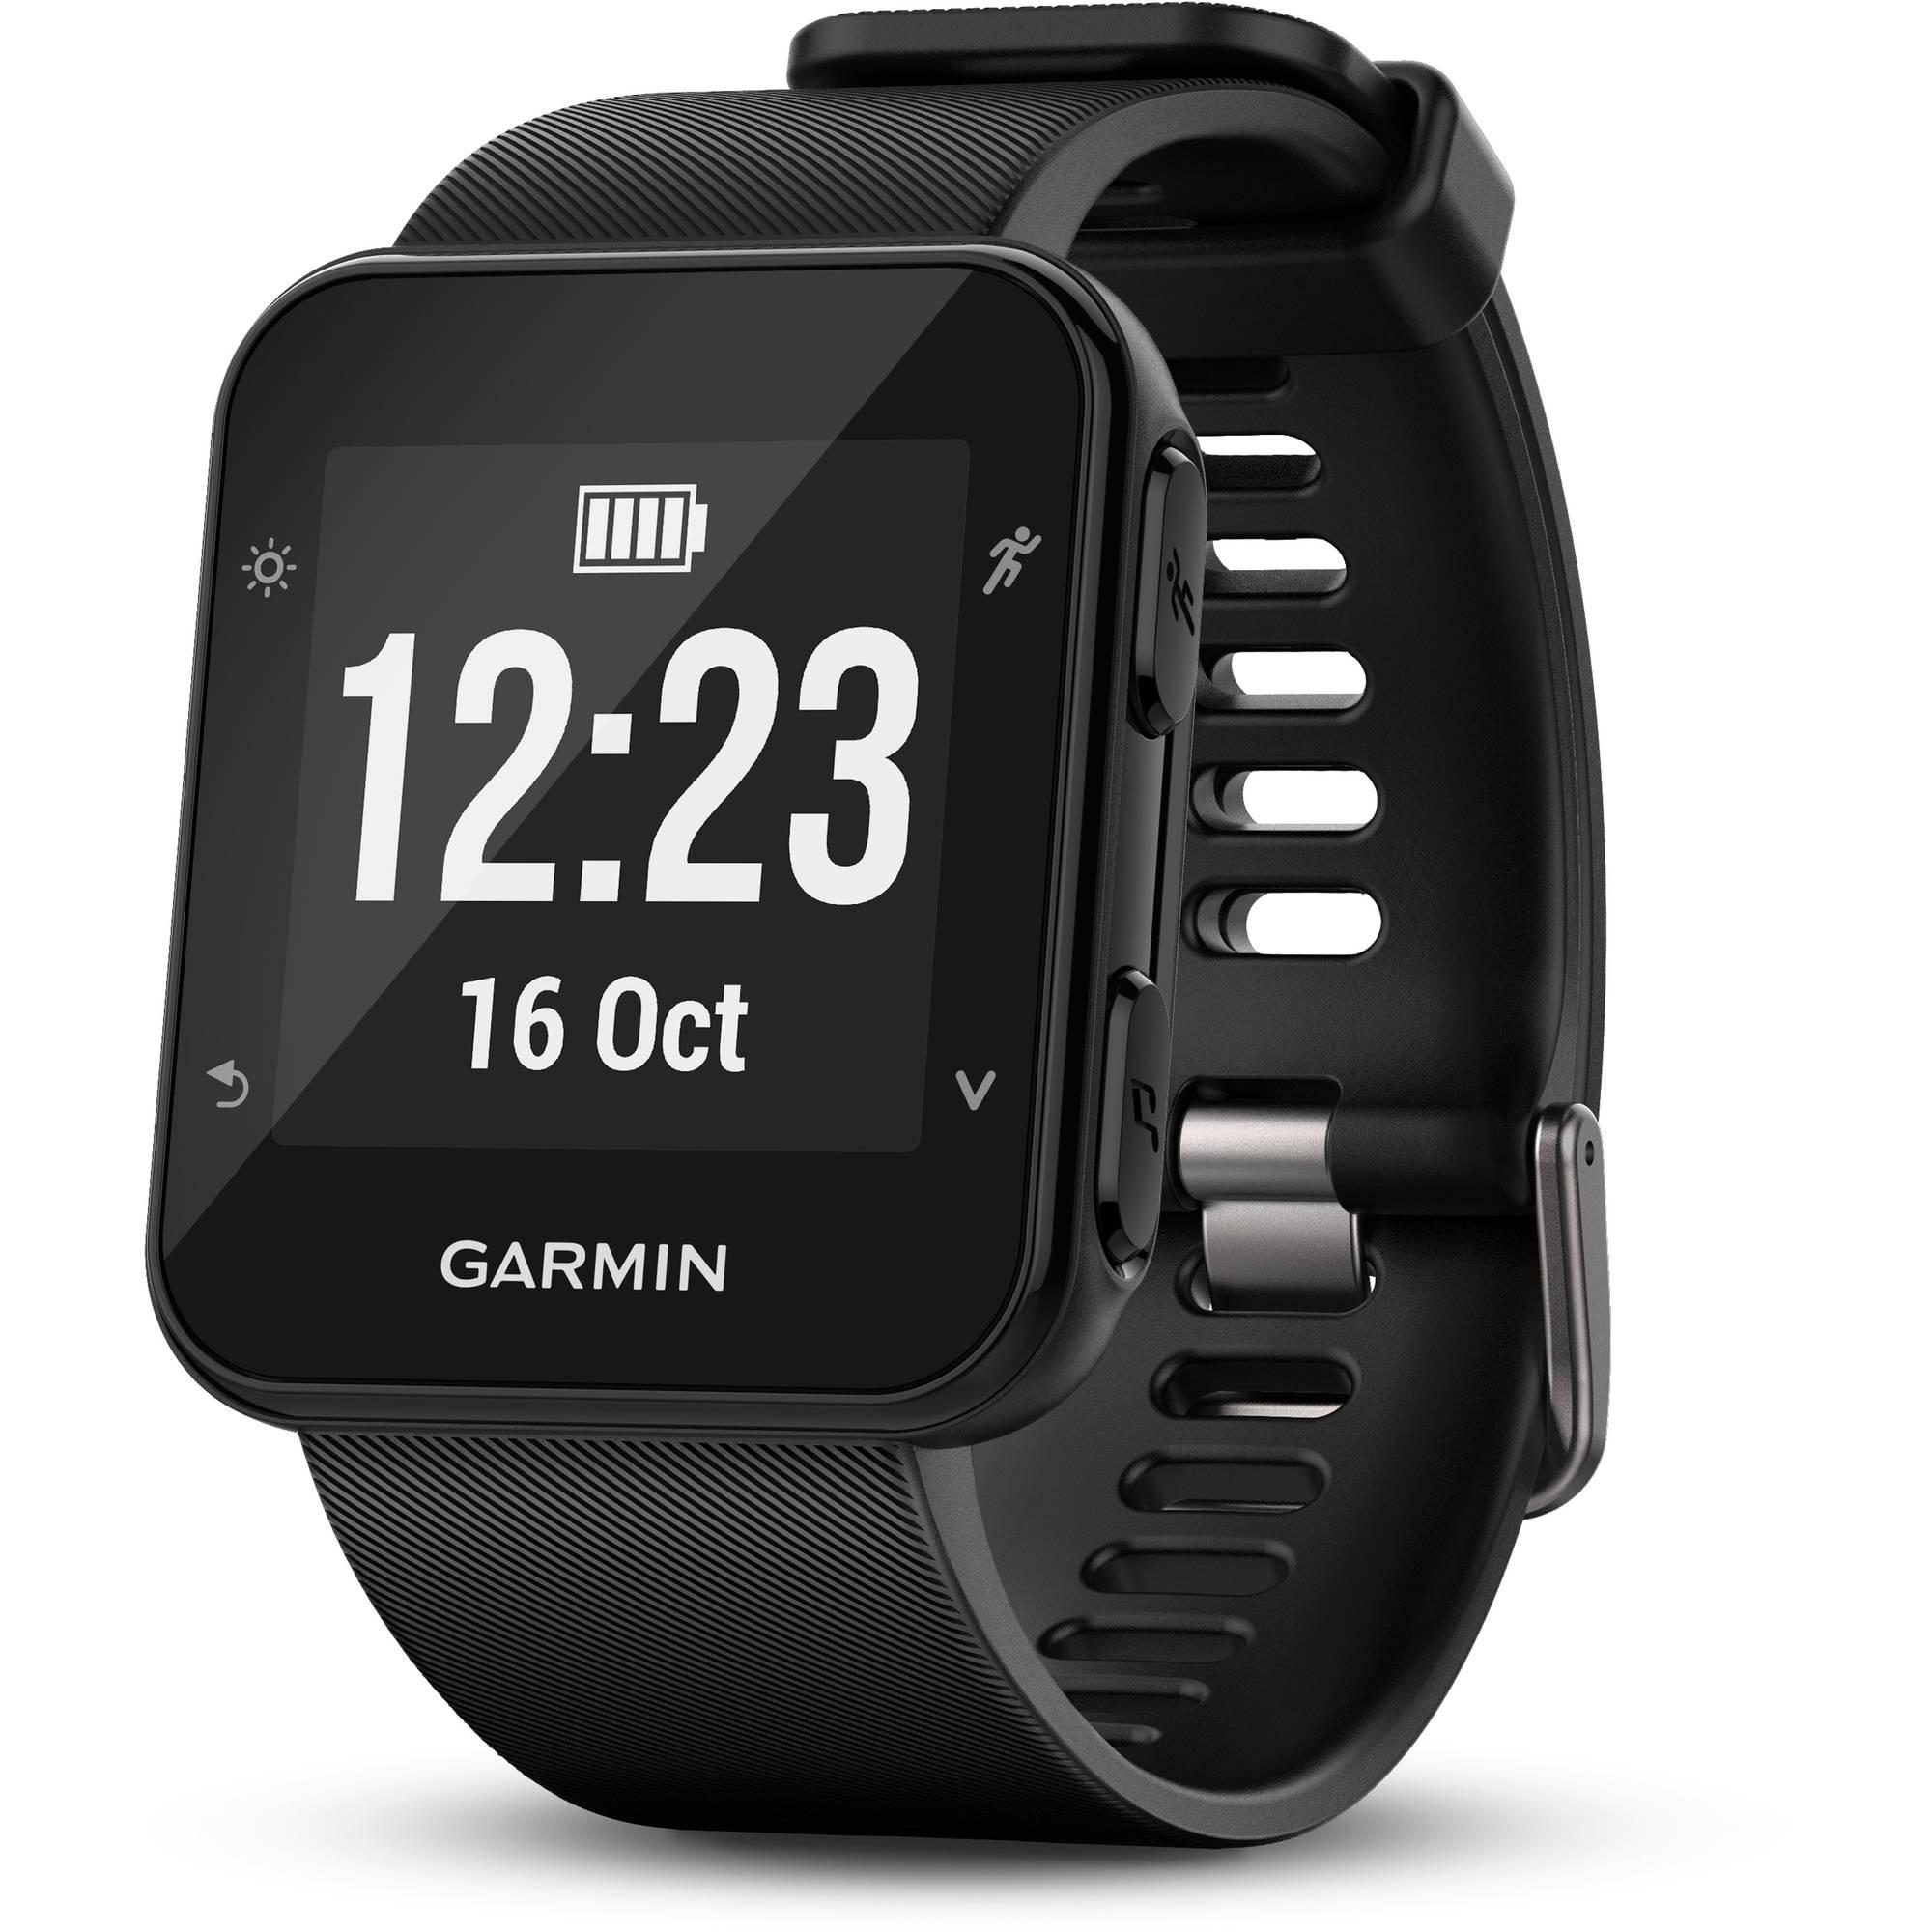 Garmin Forerunner 35 GPS Running Watch by Garmin